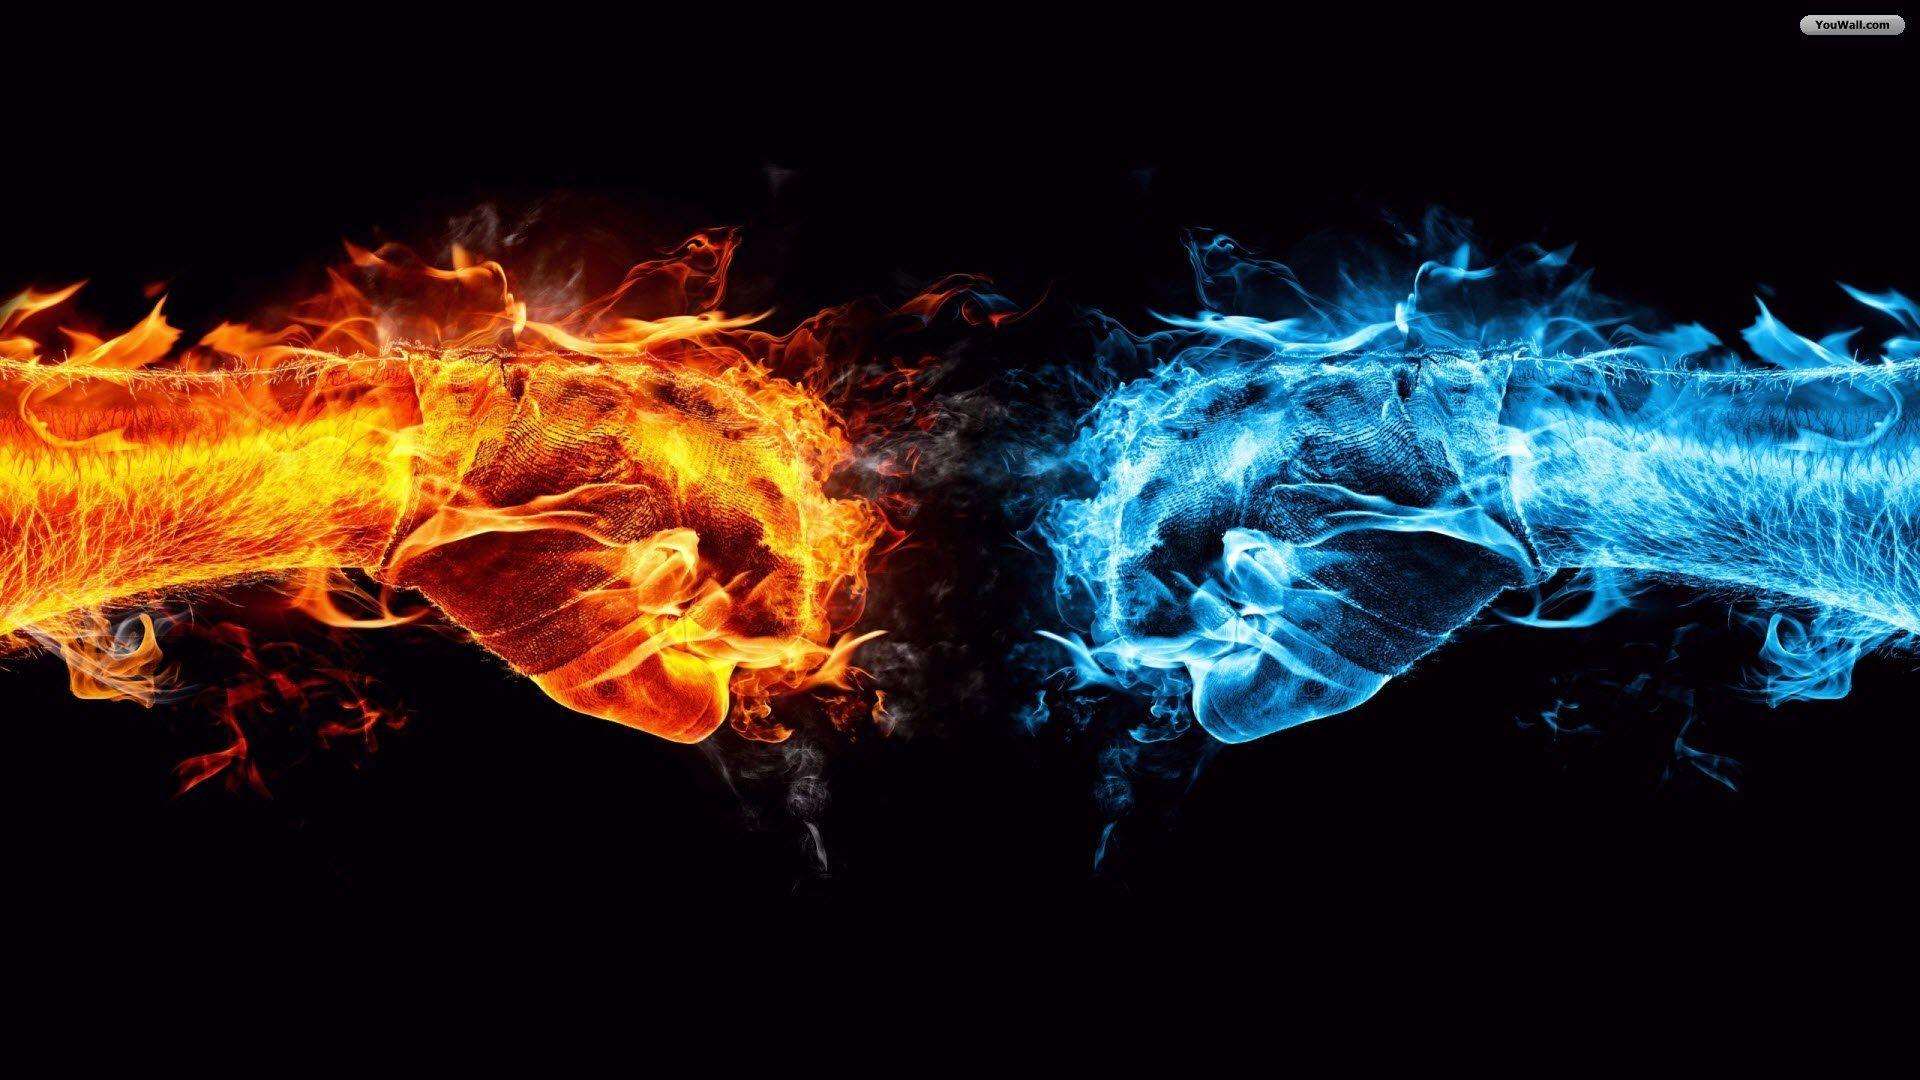 Fists Of Fire Ice Fire Art Cool Desktop Wallpapers Cool